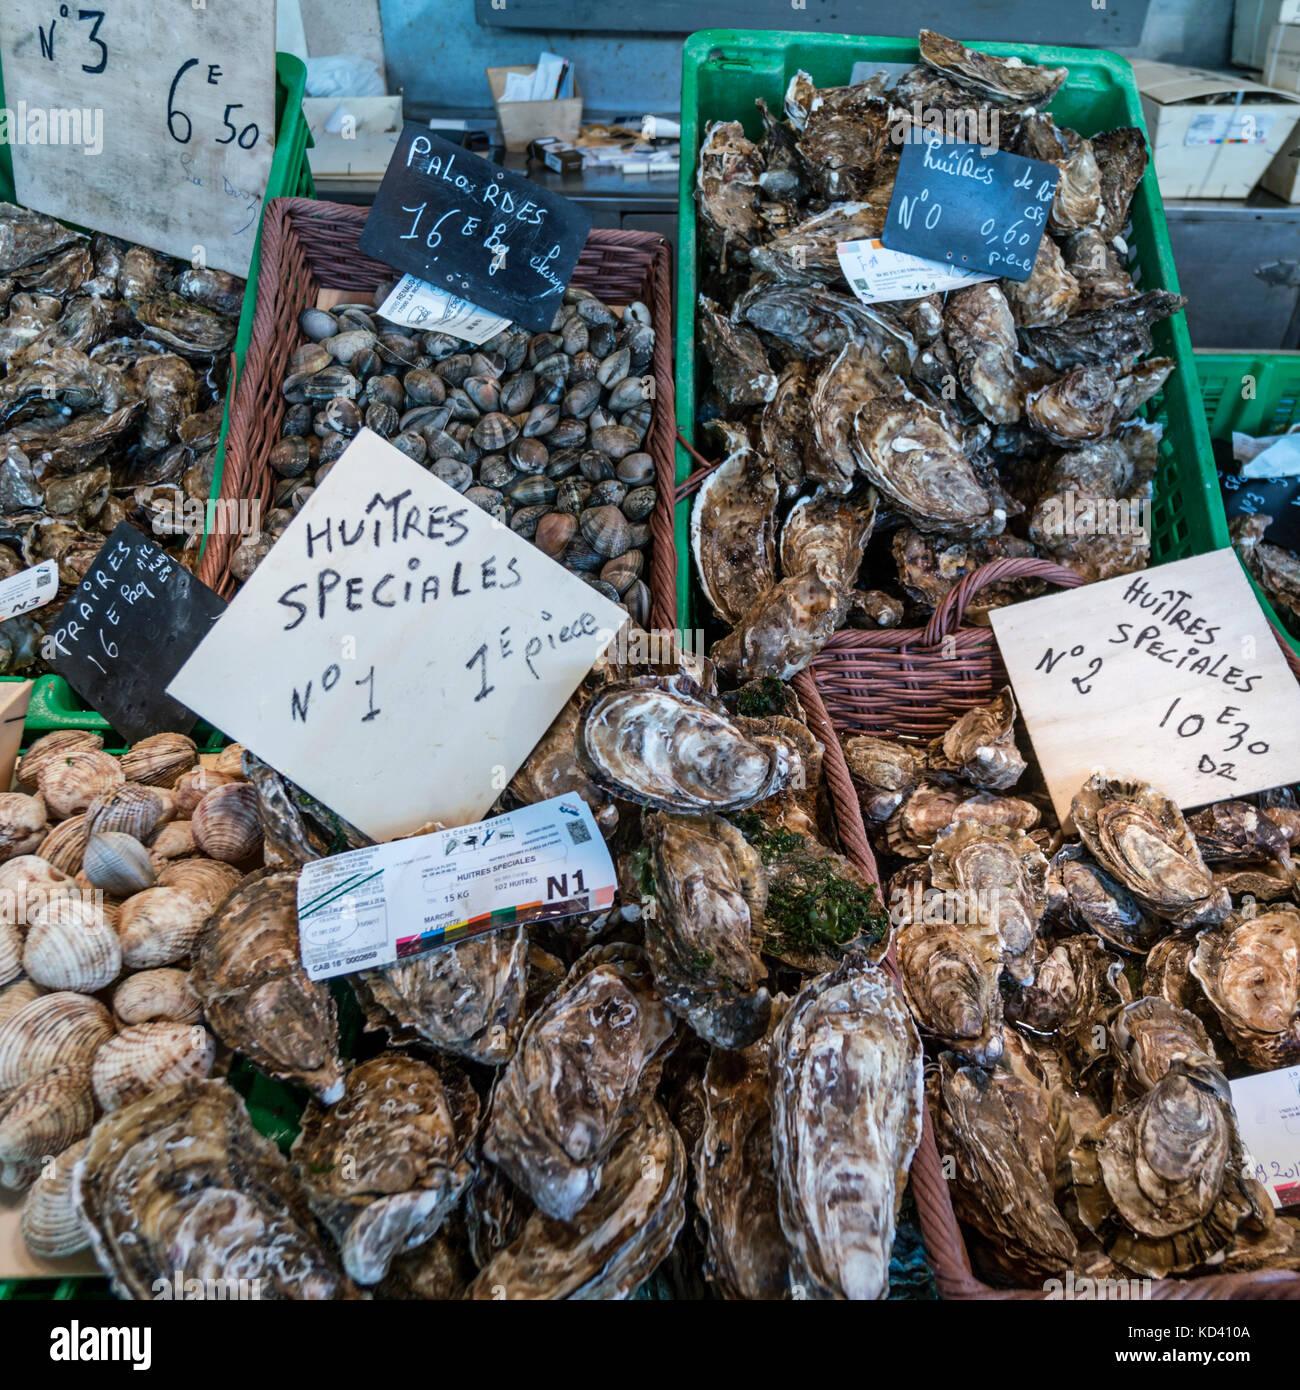 fish market, fruits de Mer, ostery, Huitres, Ile de Re, Nouvelle-Aquitaine, french westcoast, france, - Stock Image